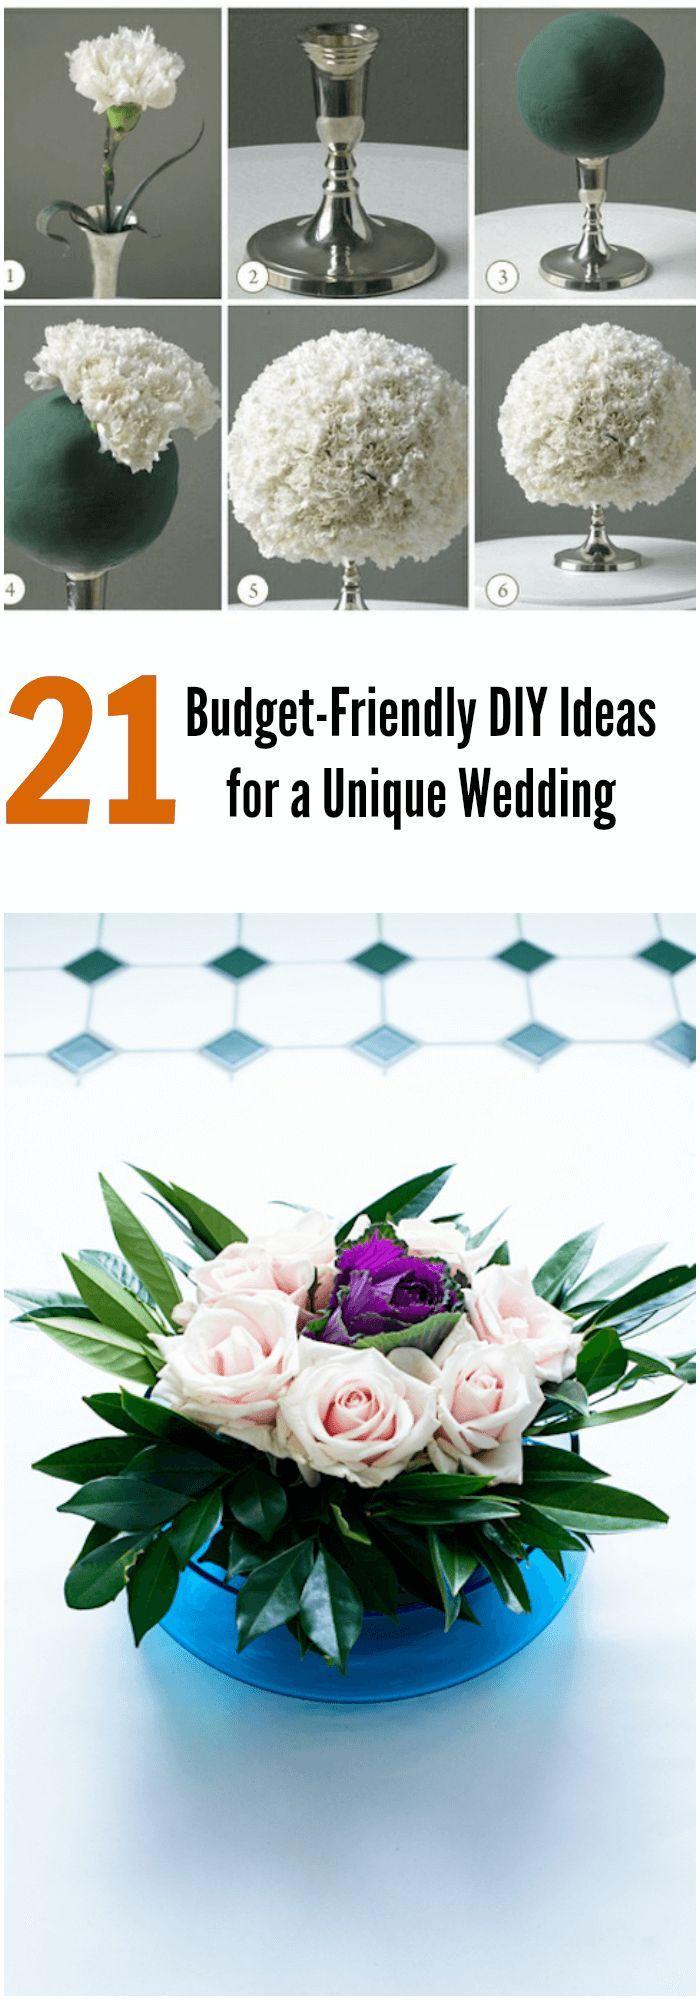 Budget Friendly Diy Home Decorating Ideas Tutorials 2017: 890 Best Budget Friendly Wedding Decor Images On Pinterest